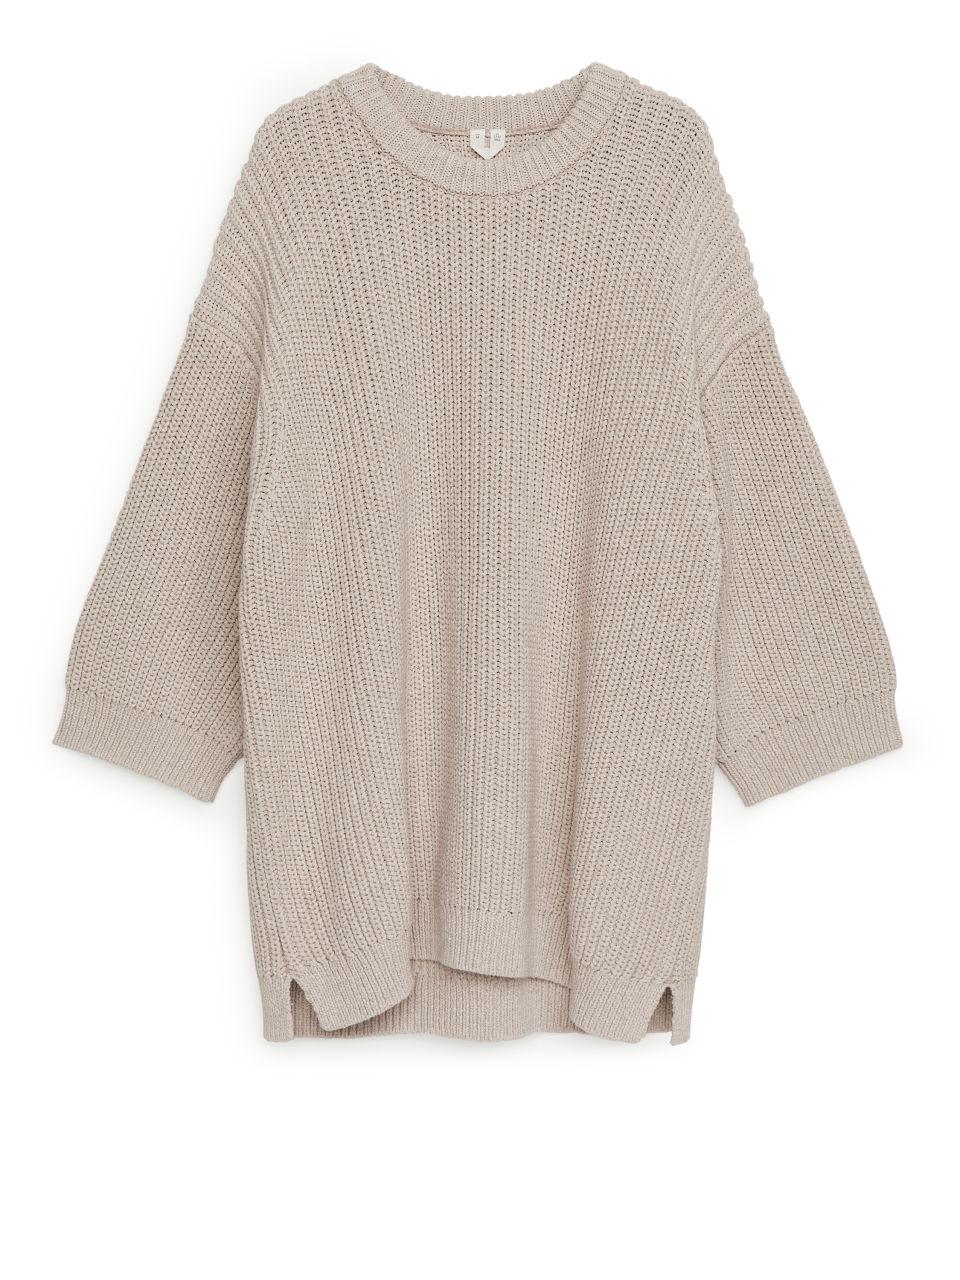 Oversized Cotton Blend Jumper - Beige